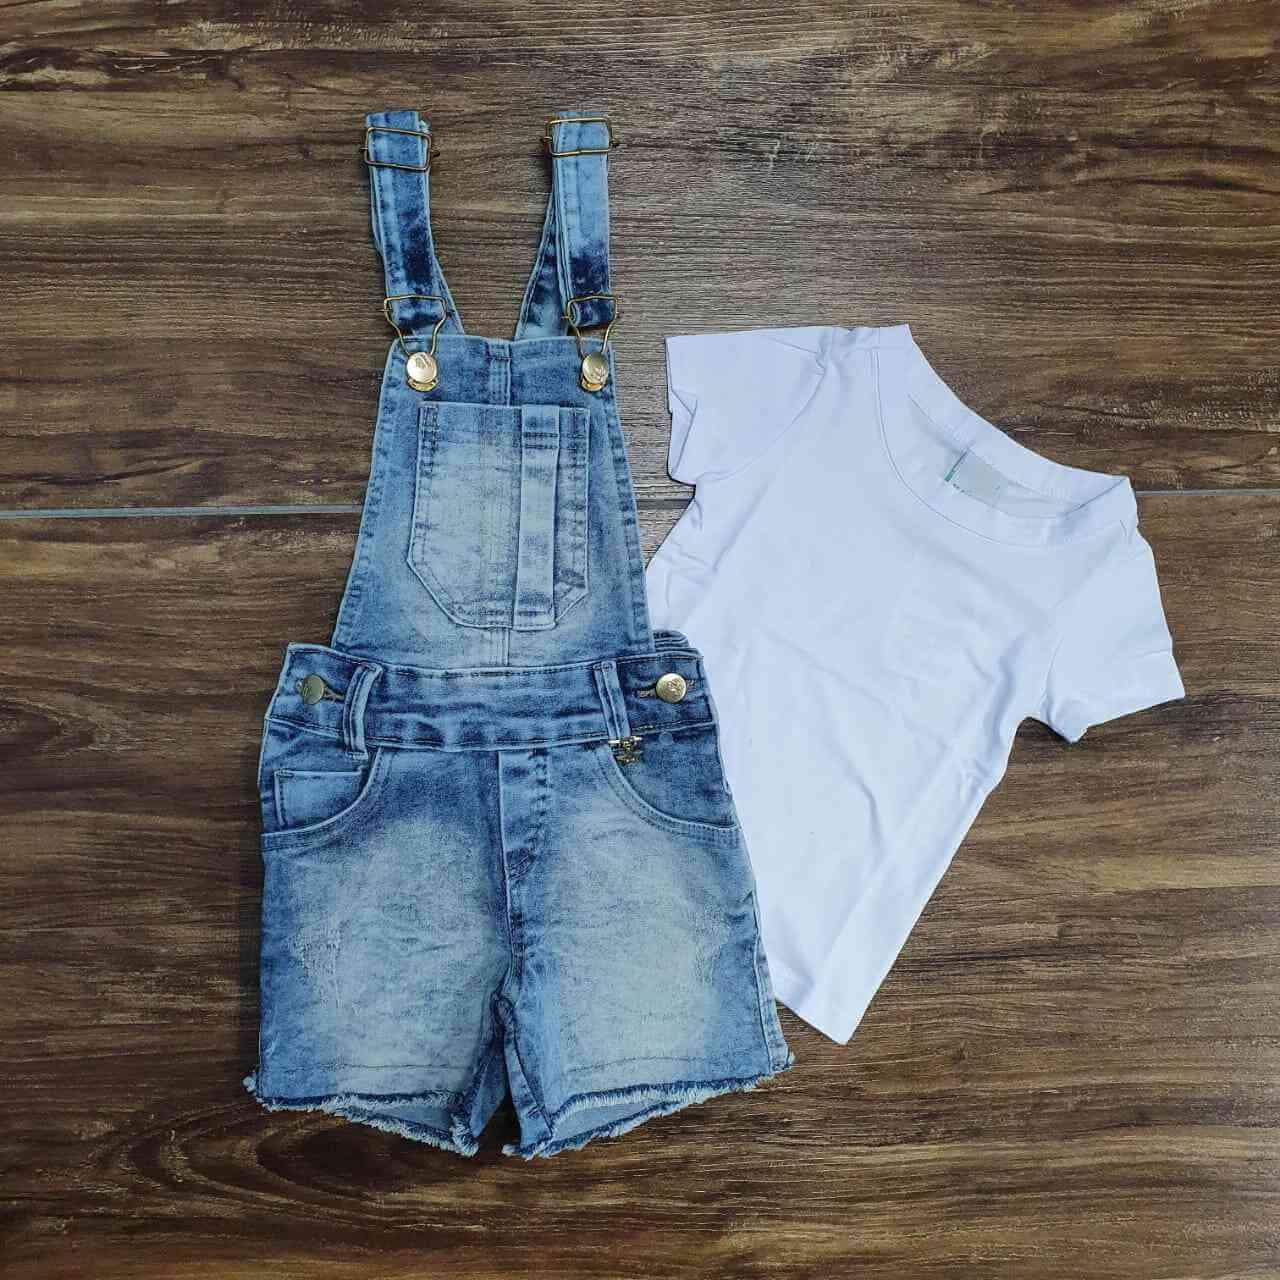 Camiseta Branca com Jardineira Bermuda Infantil